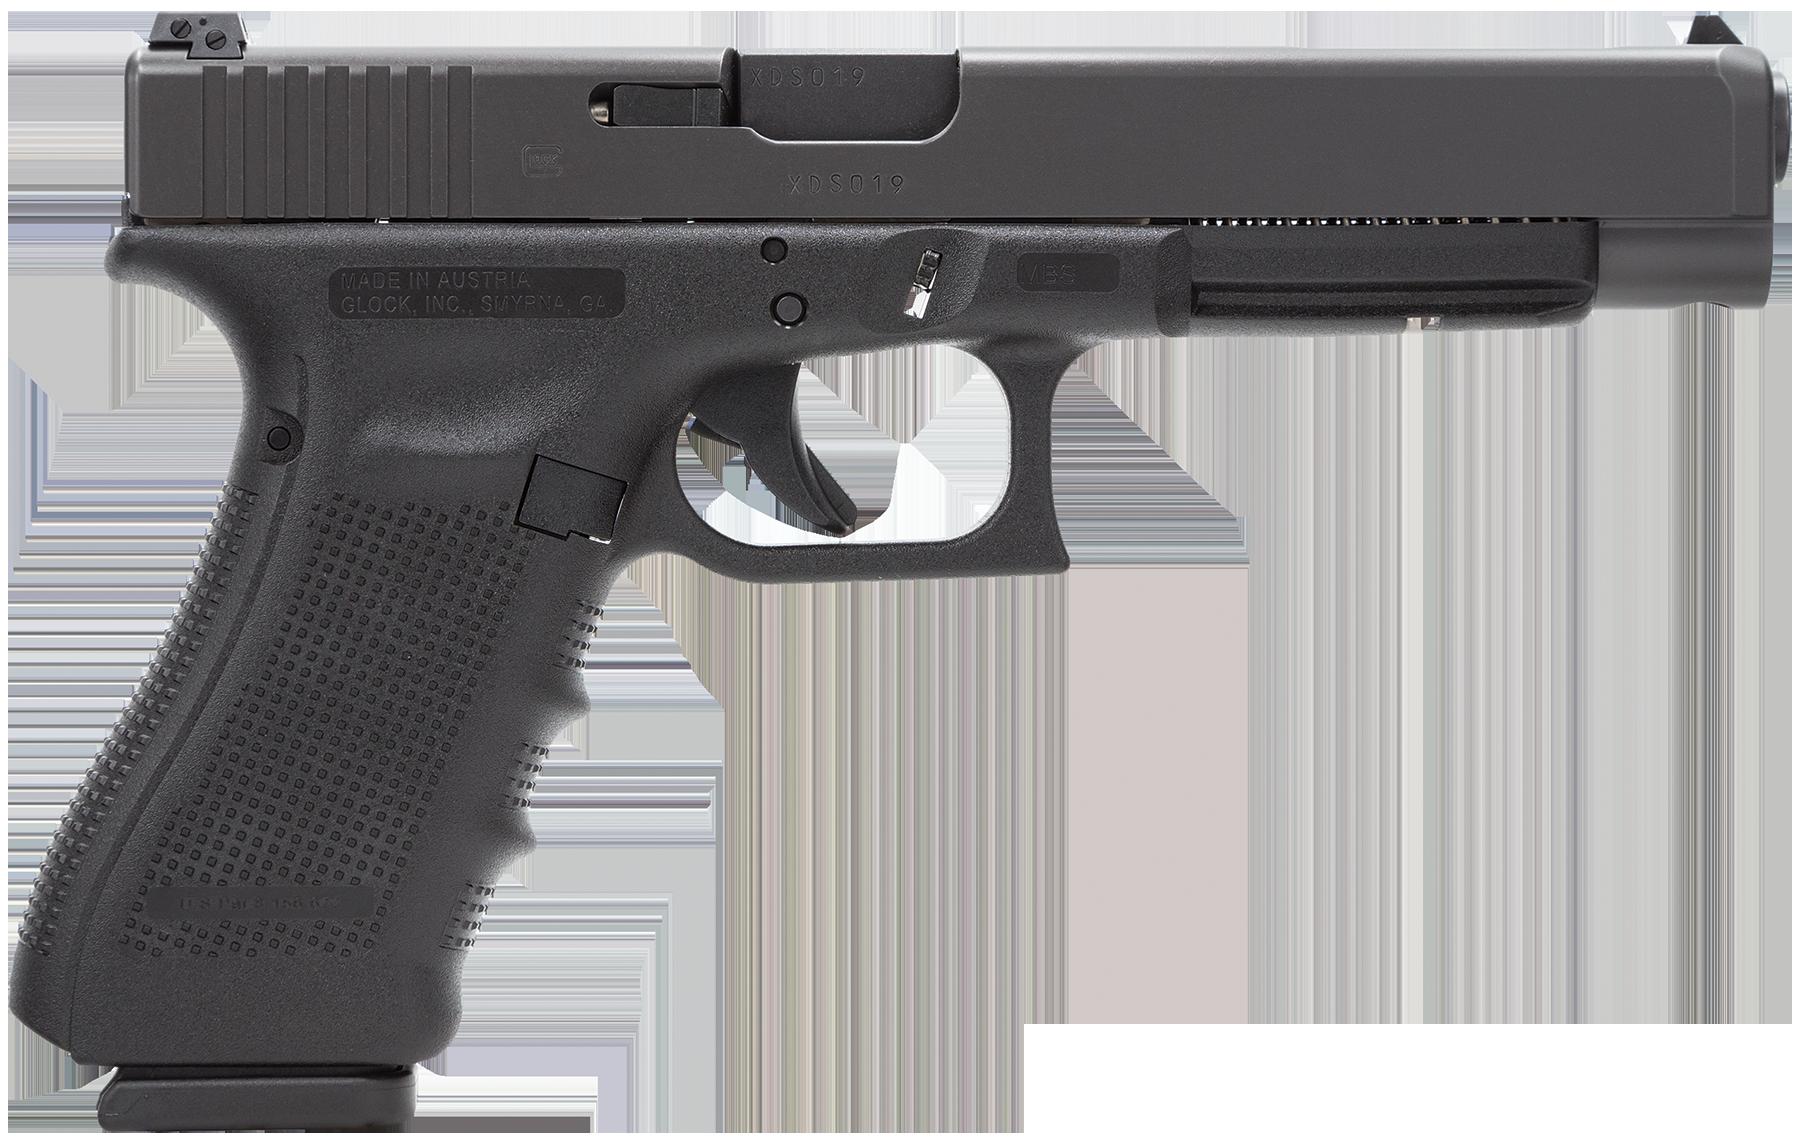 Glock 22 .40 S&W Glock Ges.m.b.H. GLOCK 17.